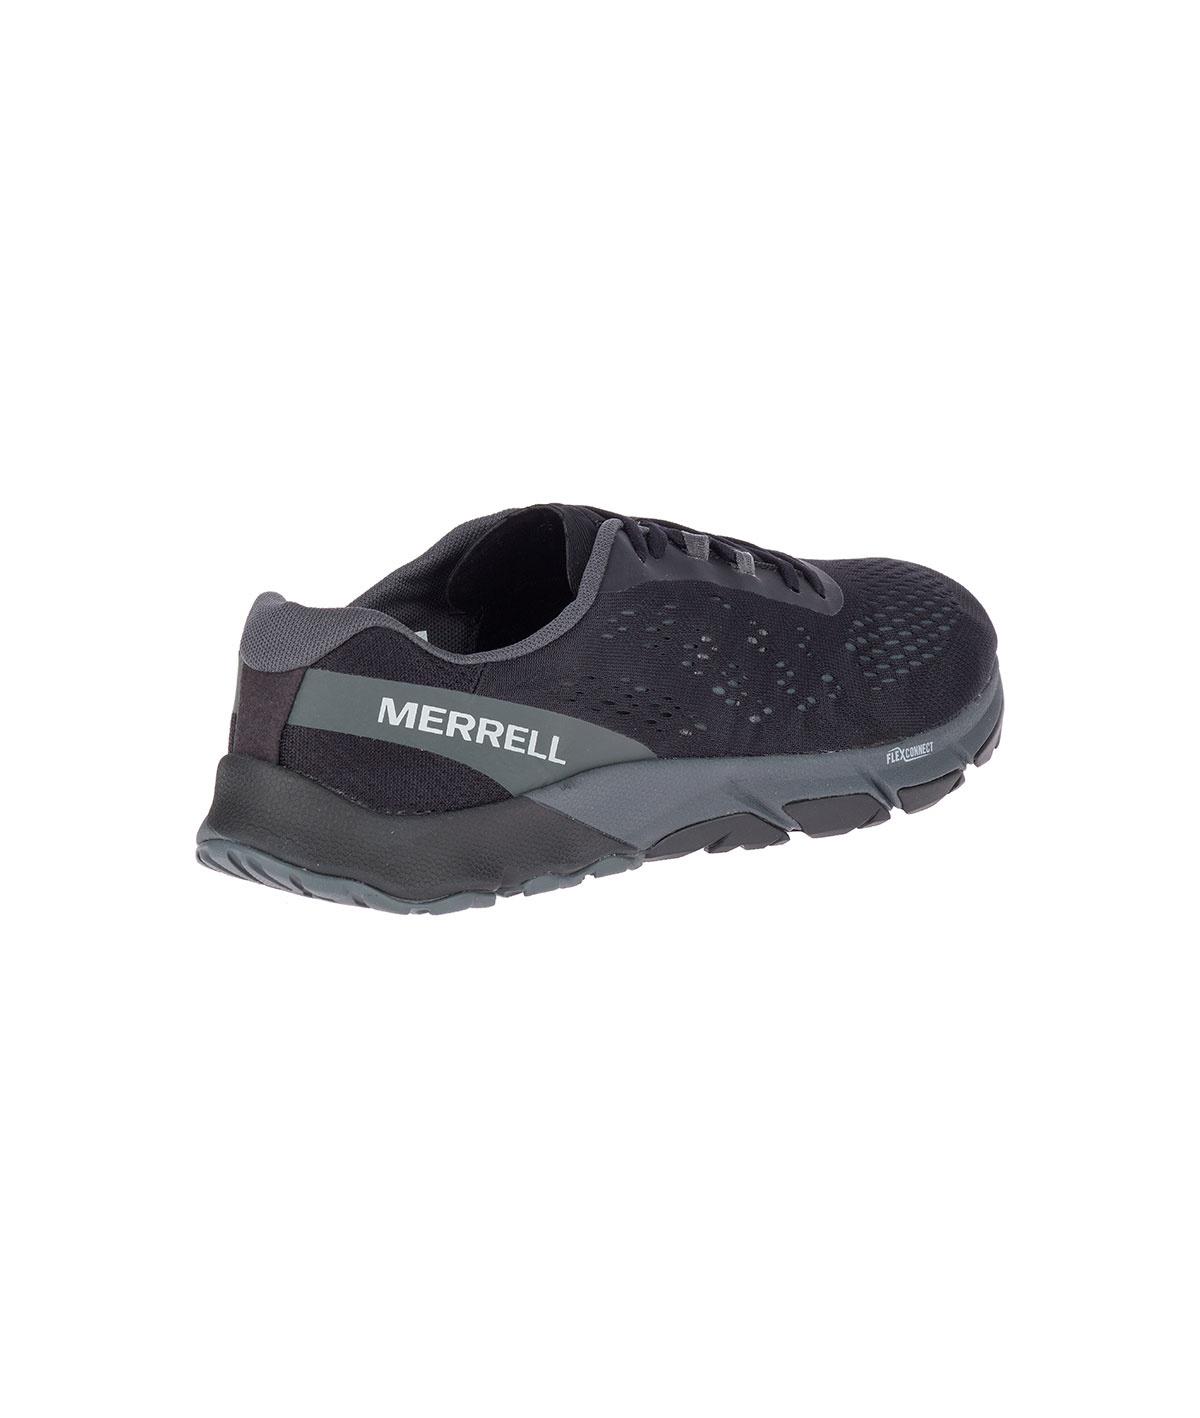 Merrell Bare access flex 2 black J5043